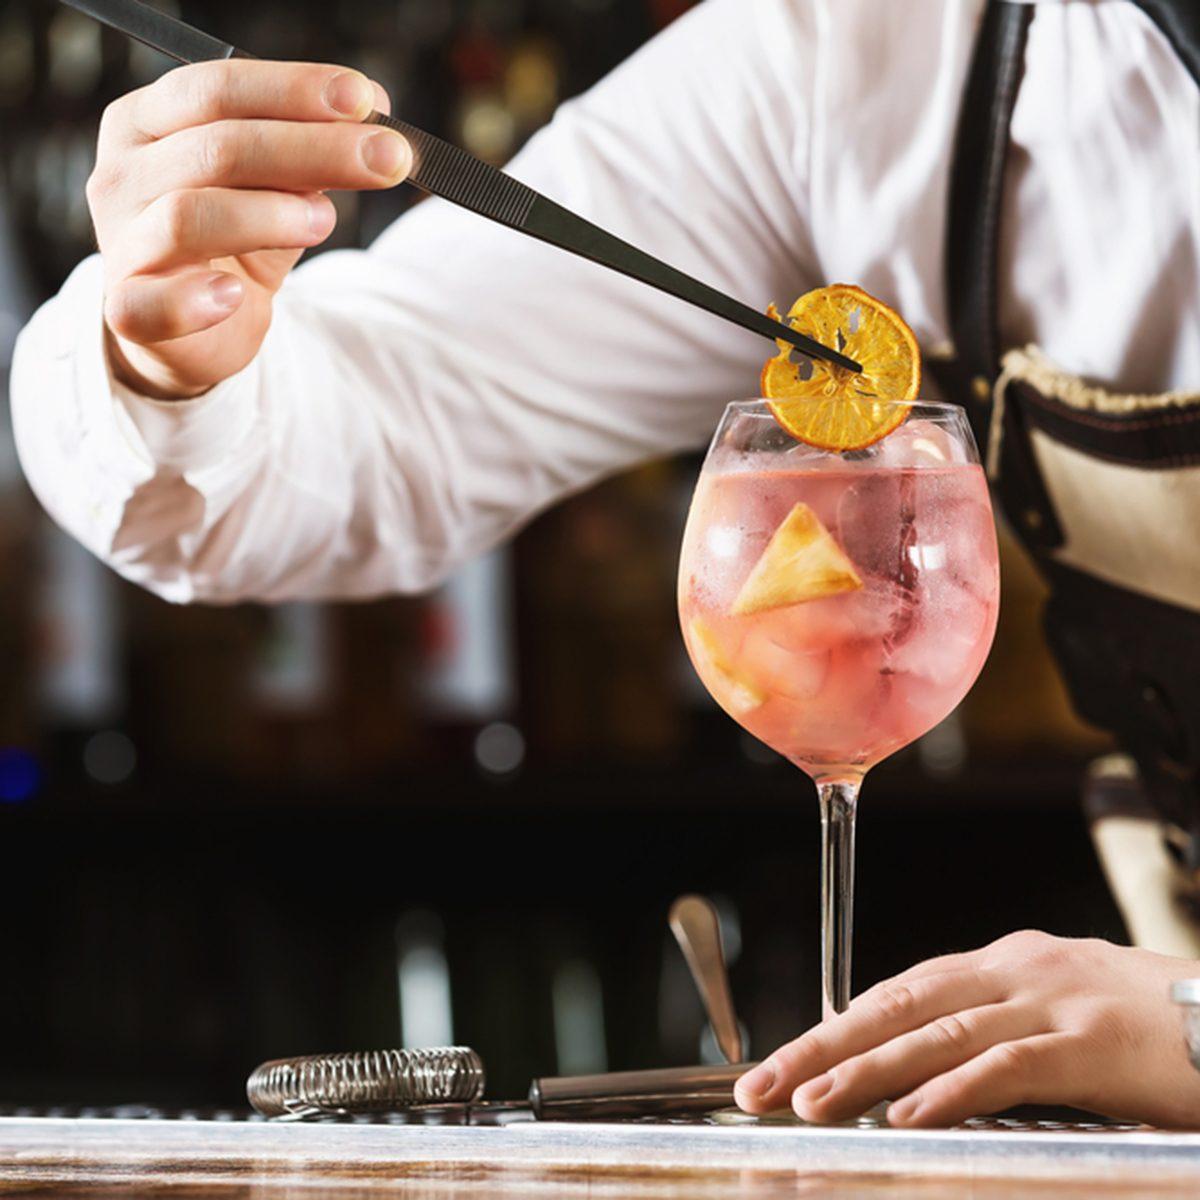 Elegant bartender is preparing pink cocktail holding orange chips at bar counter background.; Shutterstock ID 641031601; Job (TFH, TOH, RD, BNB, CWM, CM): TOH